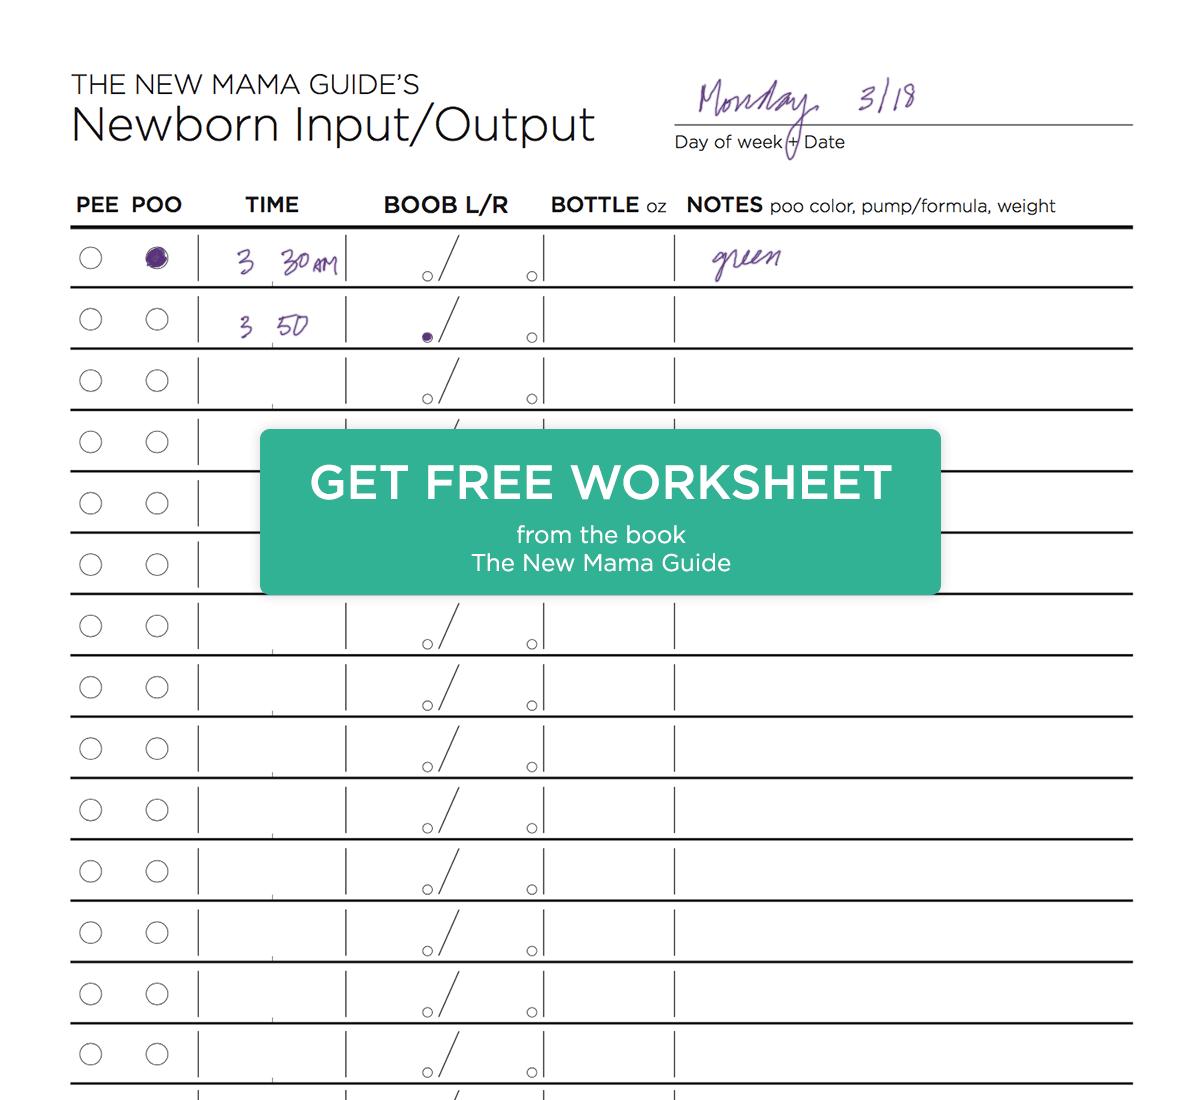 Newborn Input Output Worksheet New Mama Guide